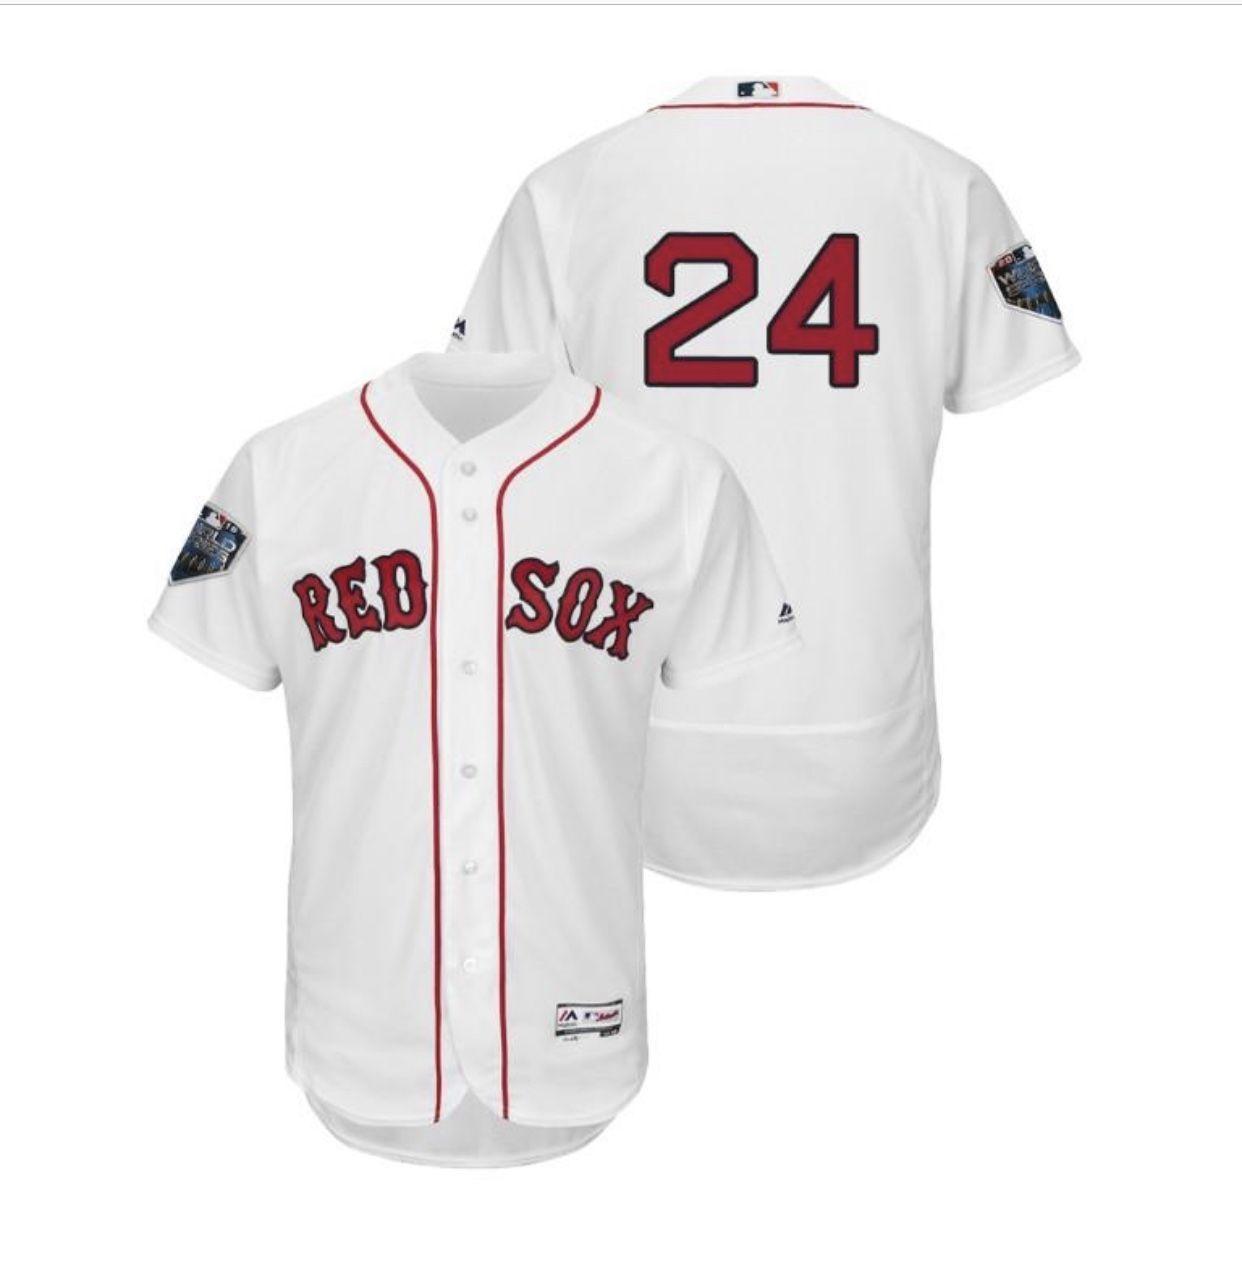 5938f88ea3d 2018 World  Series Boston Red Sox White  24 David  Price Flex Base Jersey